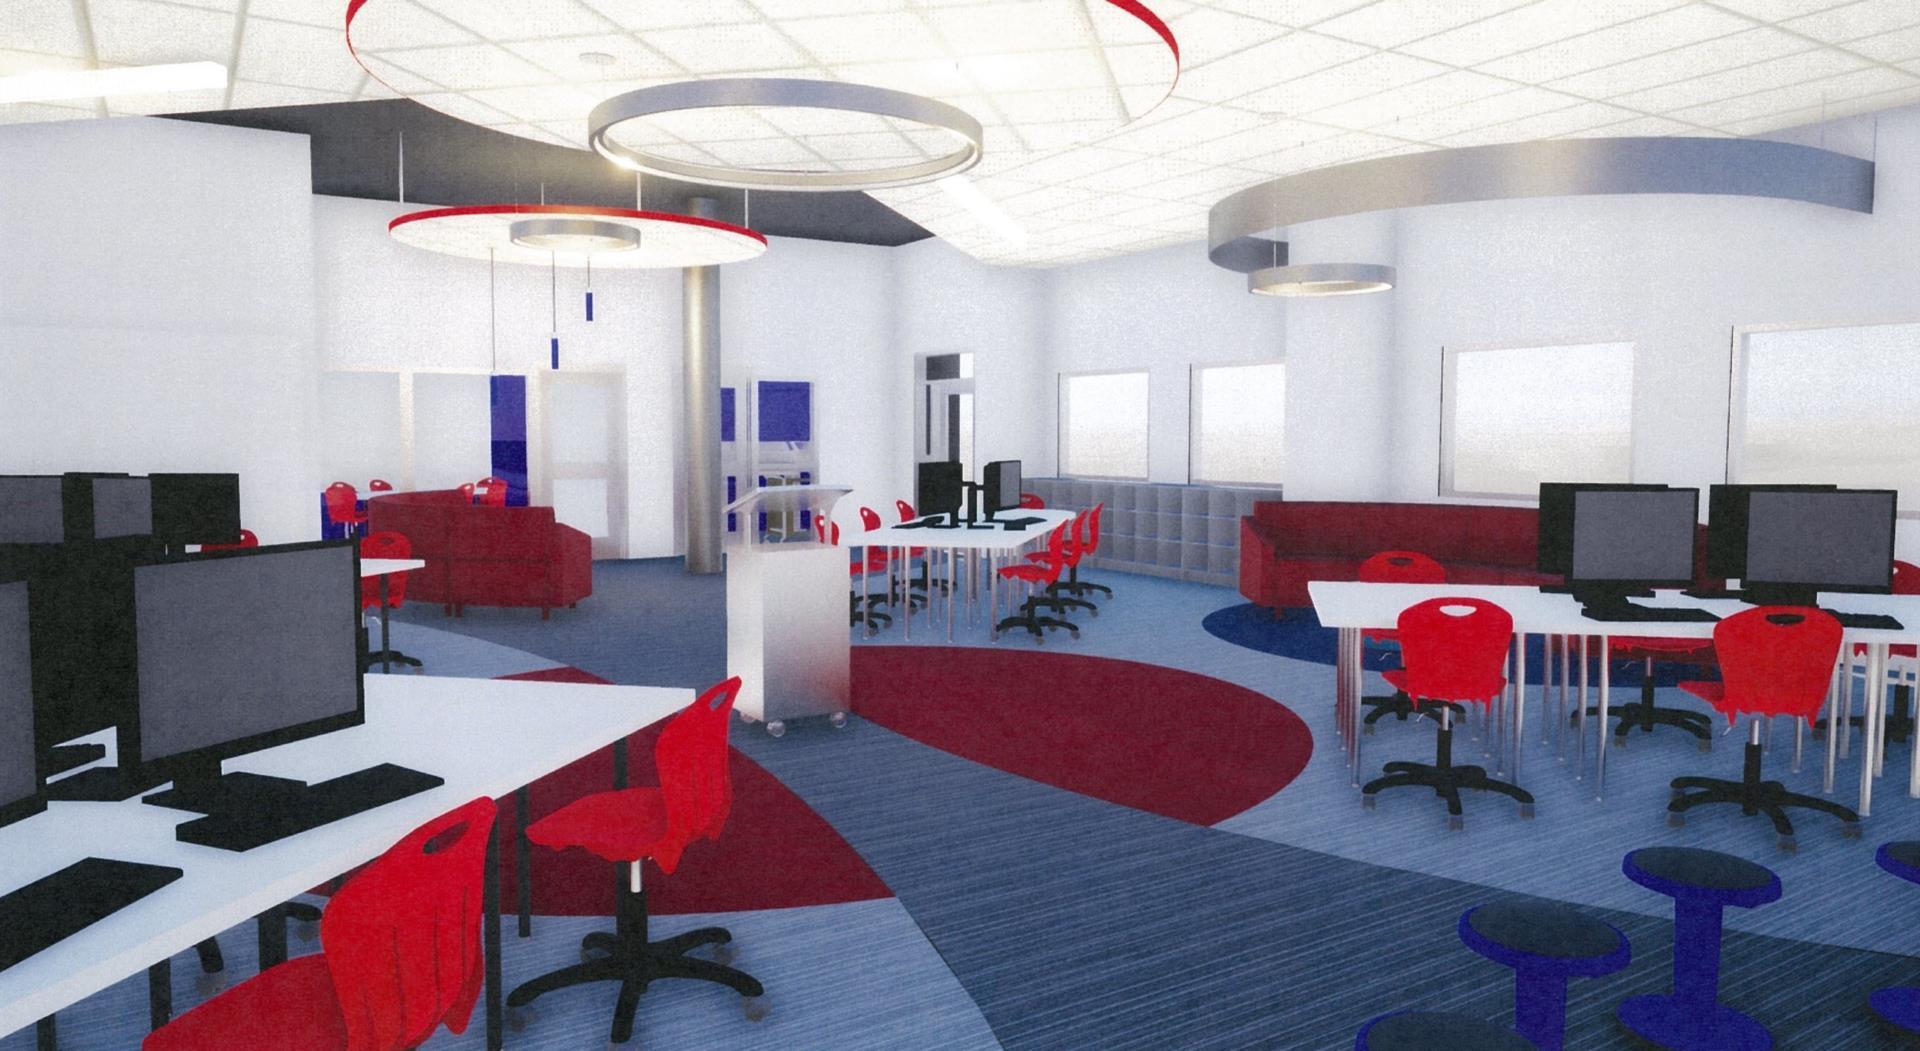 Lab interior view 2